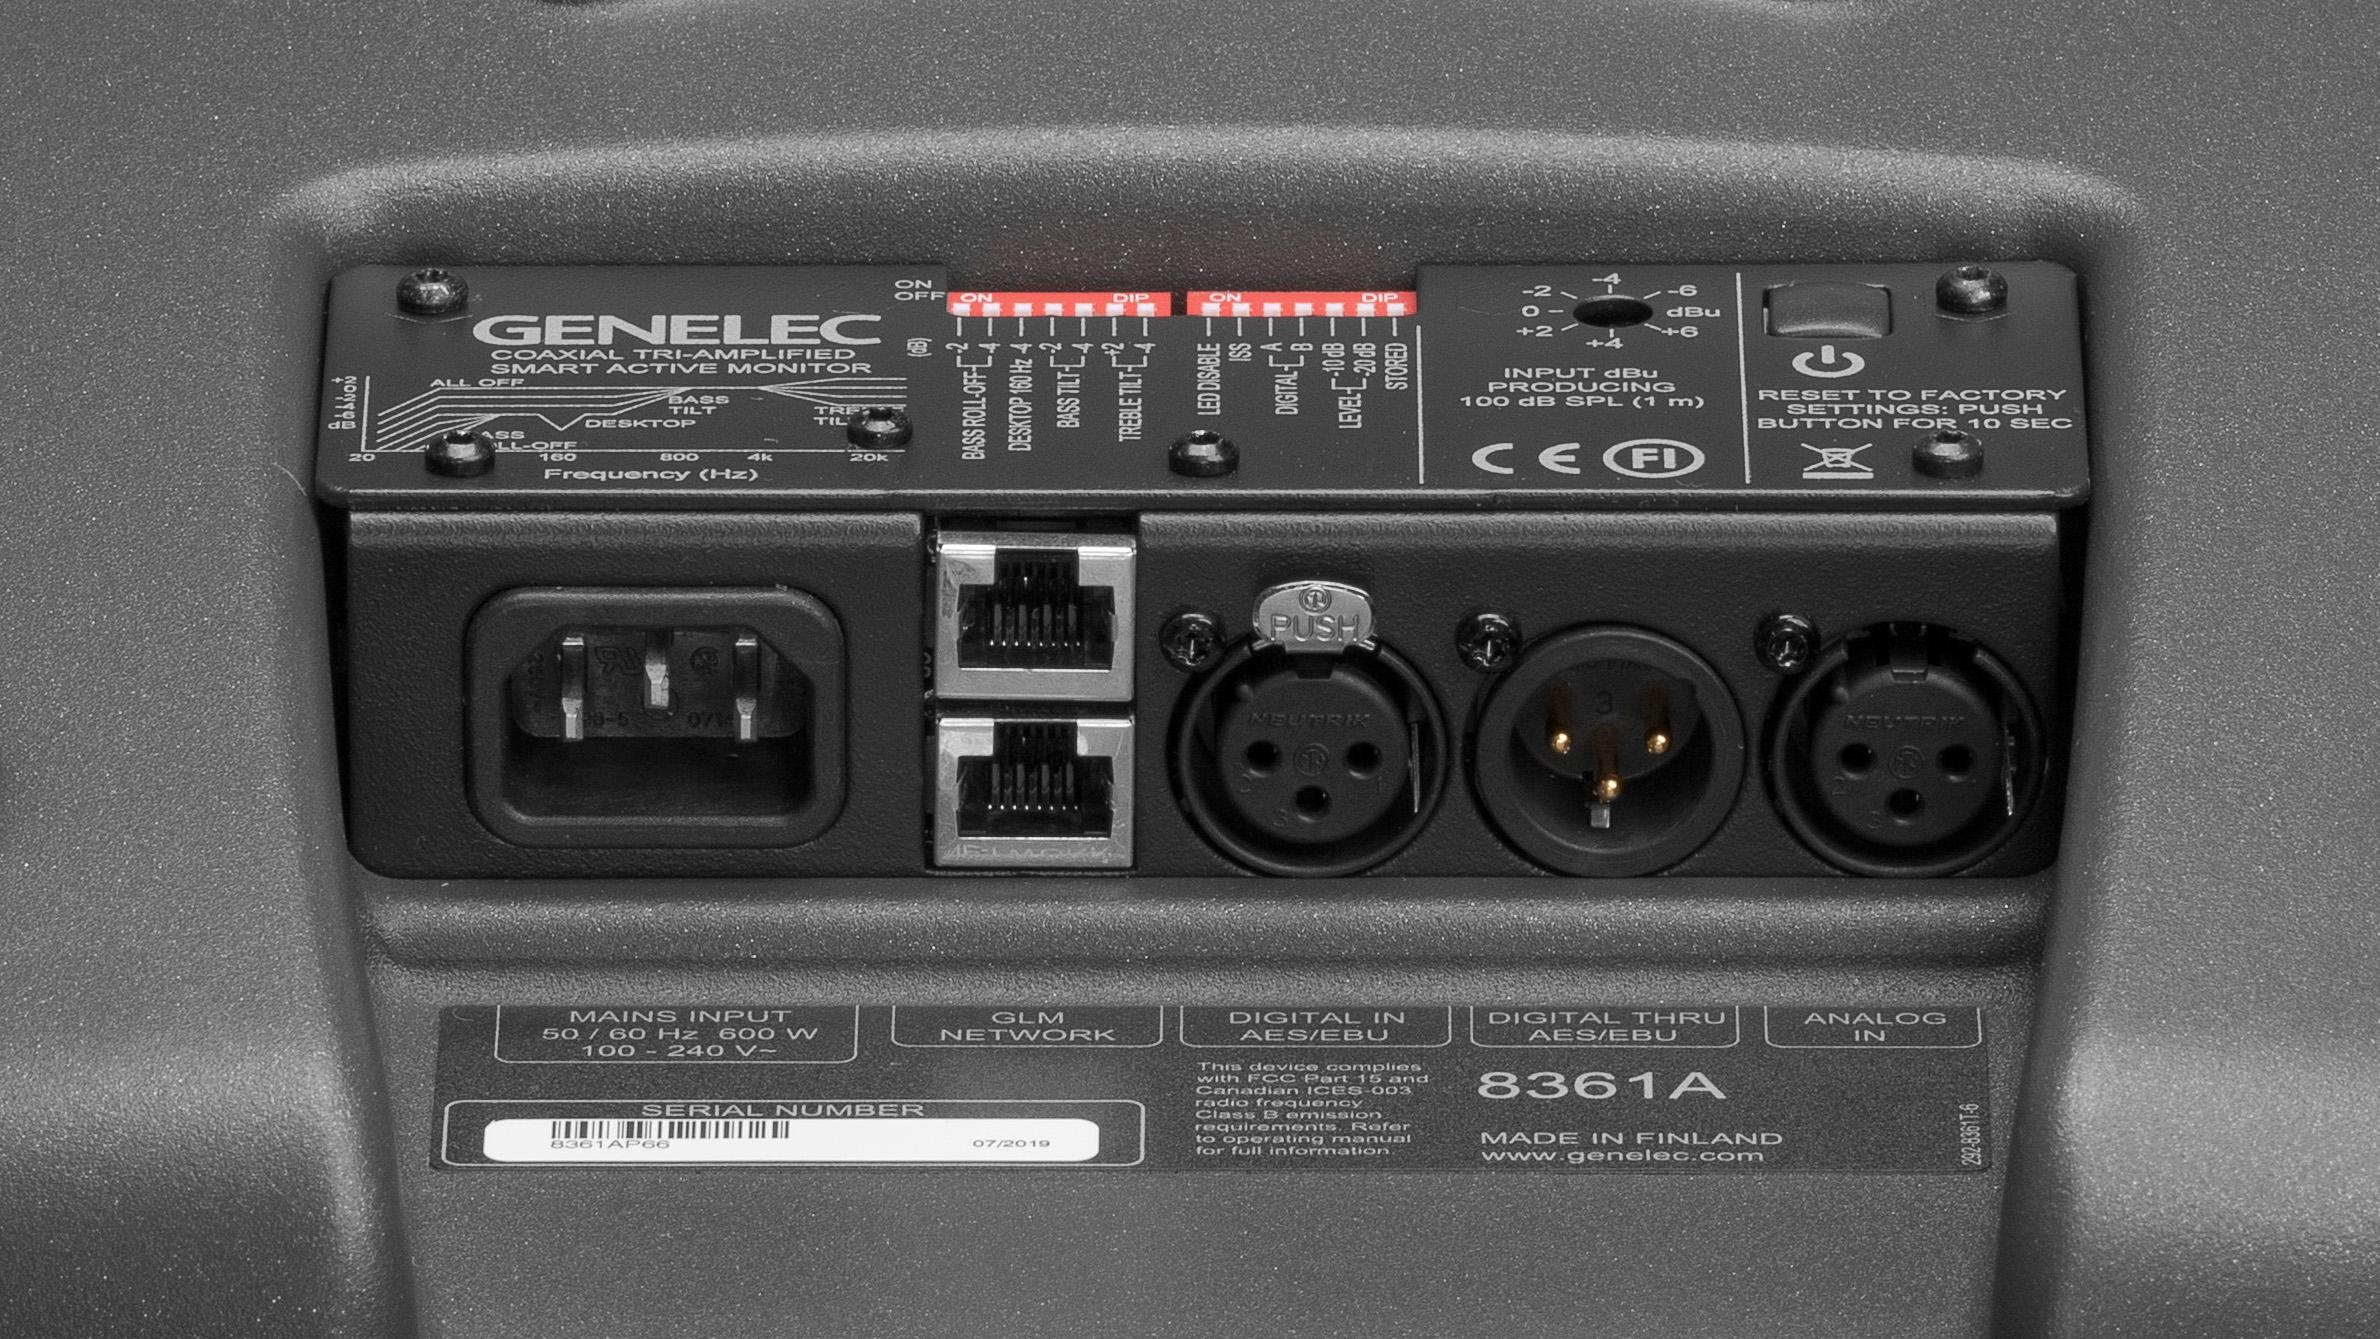 Genelec 8361A connections